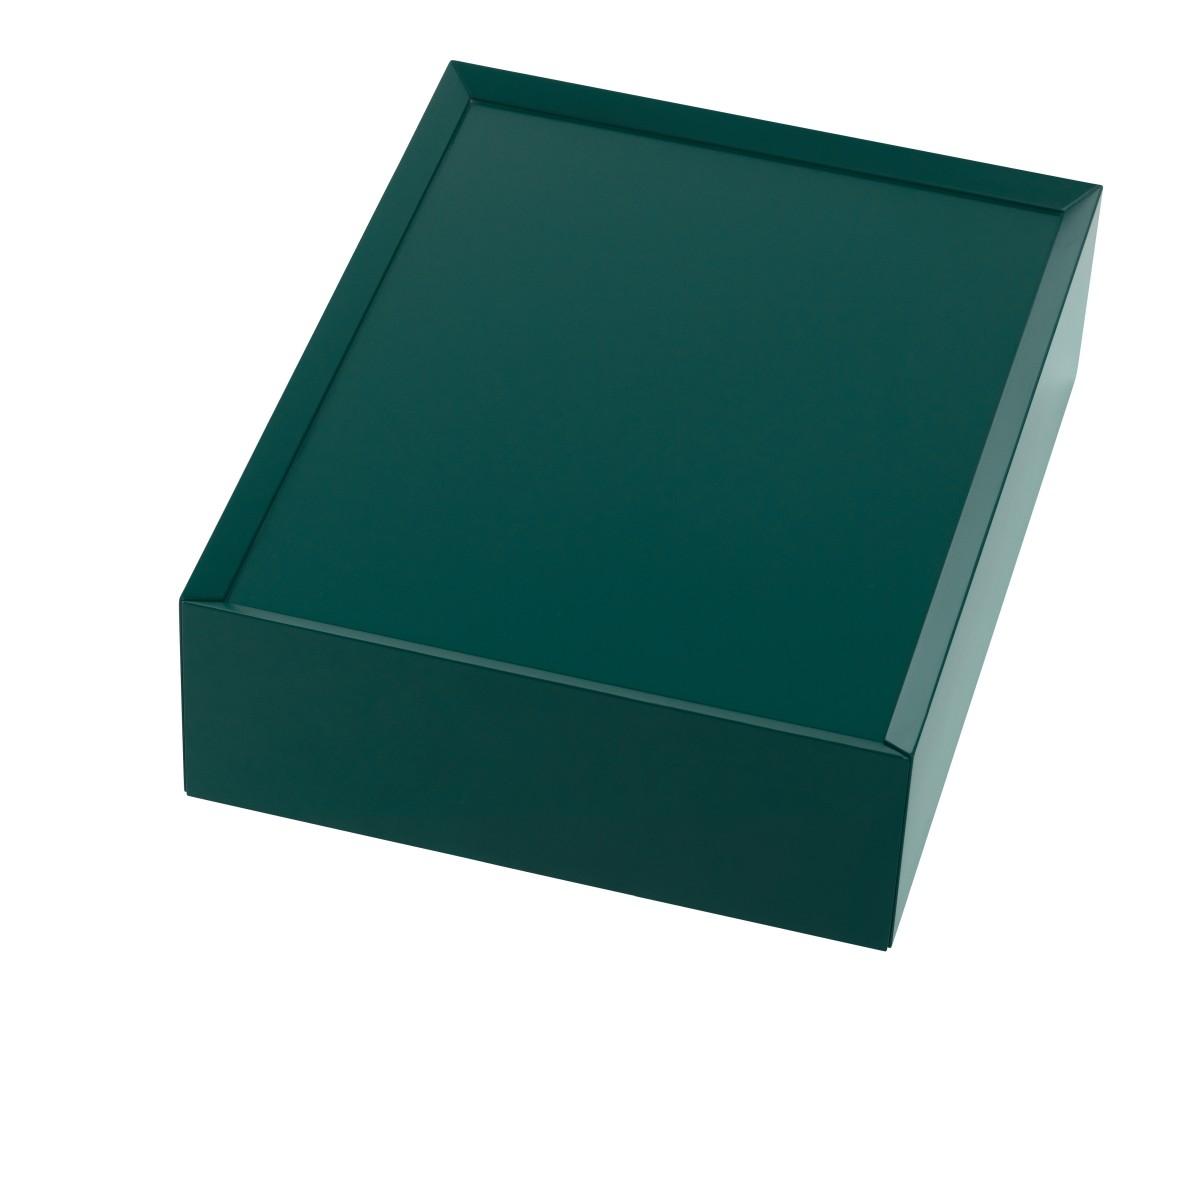 SOUVENIR Schubkastenbox klein smaragdgrün (42), geschlossen